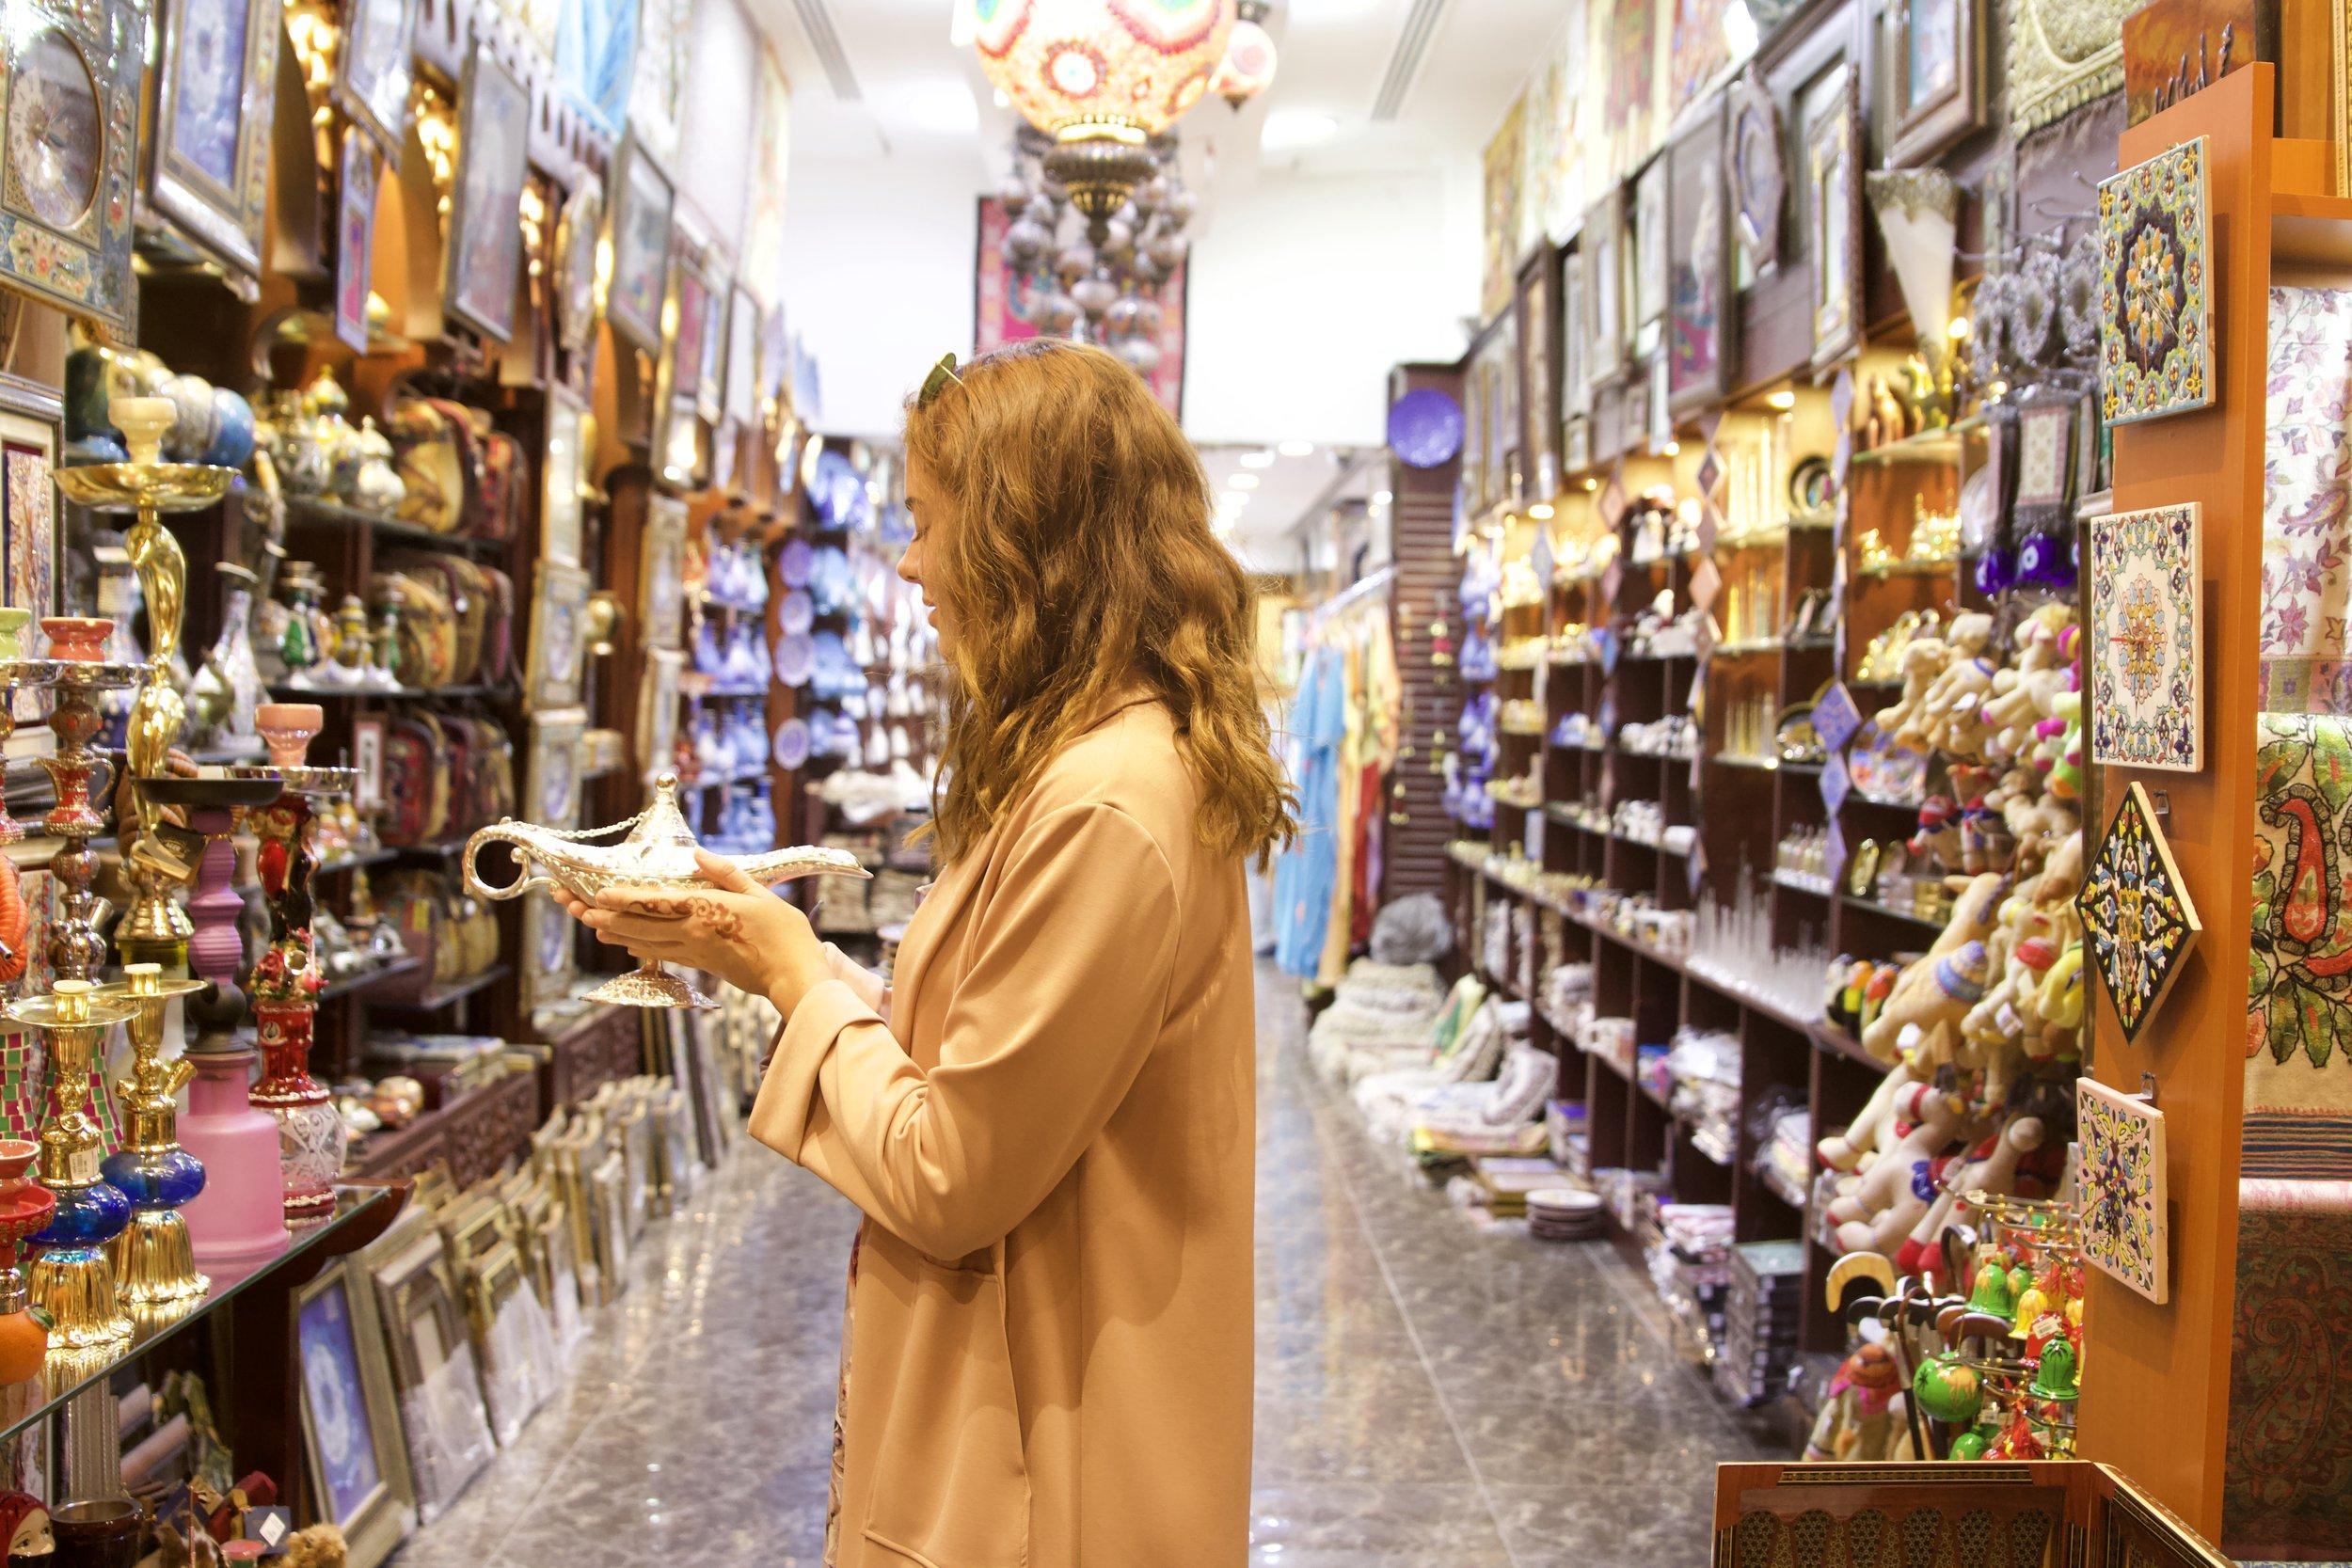 Eira making a wish at market store.